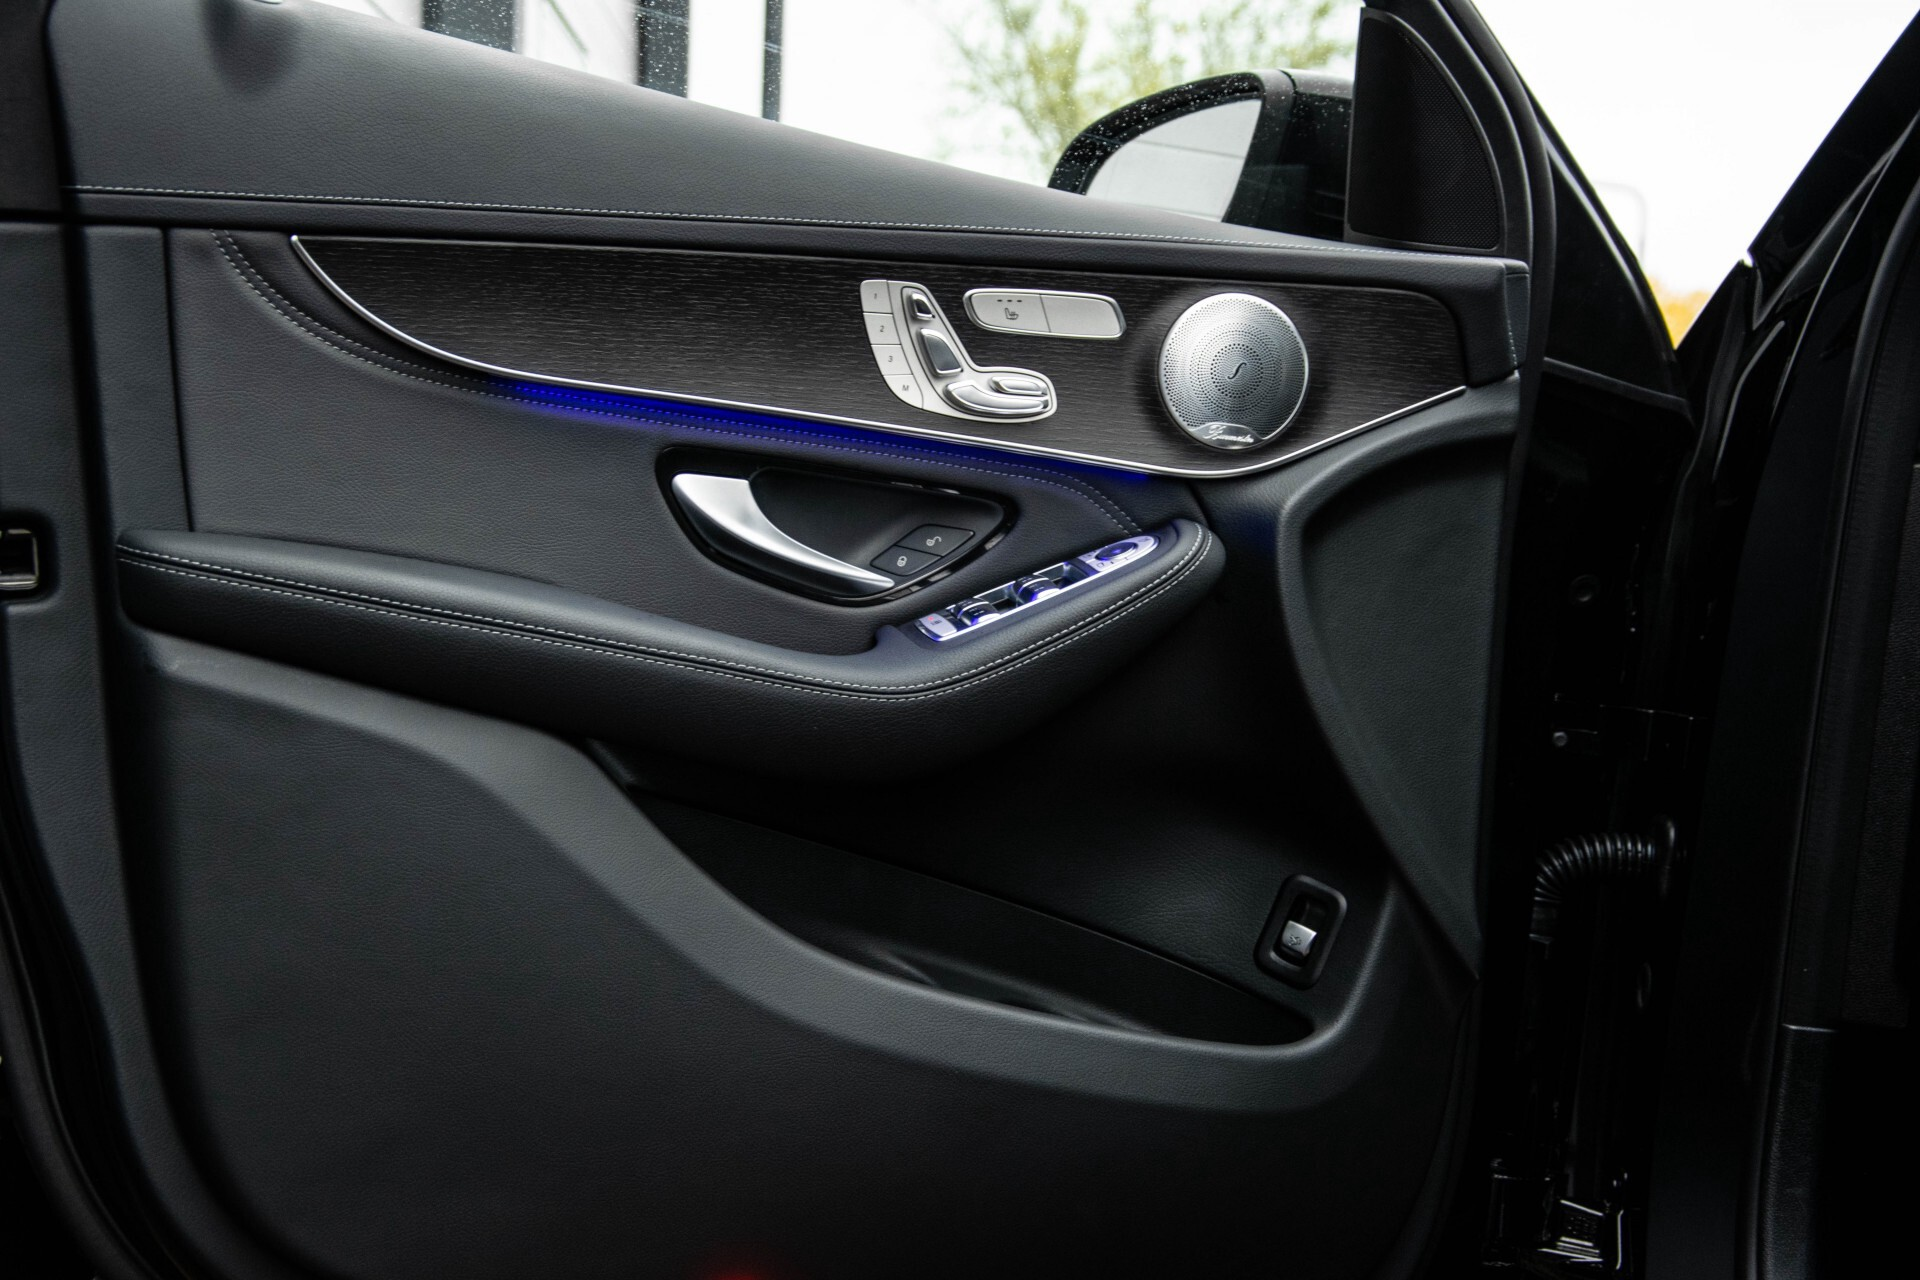 Mercedes-Benz GLC 200 4-M AMG Night/Panorama/Distronic Pro/Burmester/360camera/Exclusive Aut9 Foto 36